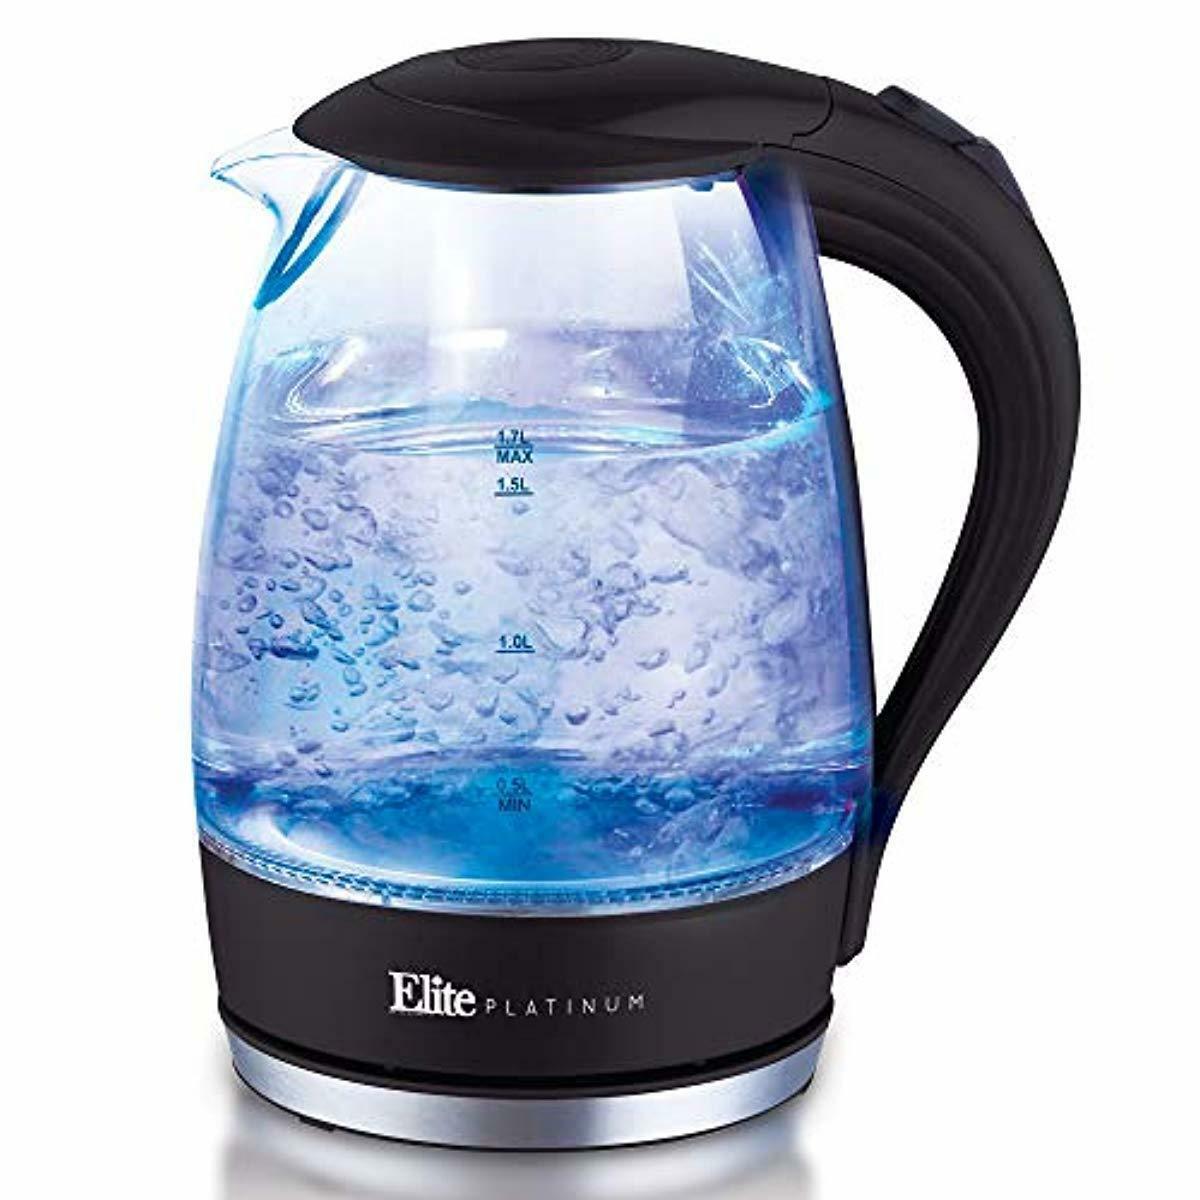 Elite Platinum EKT-300 Glass Electric Tea Kettle Hot Water H